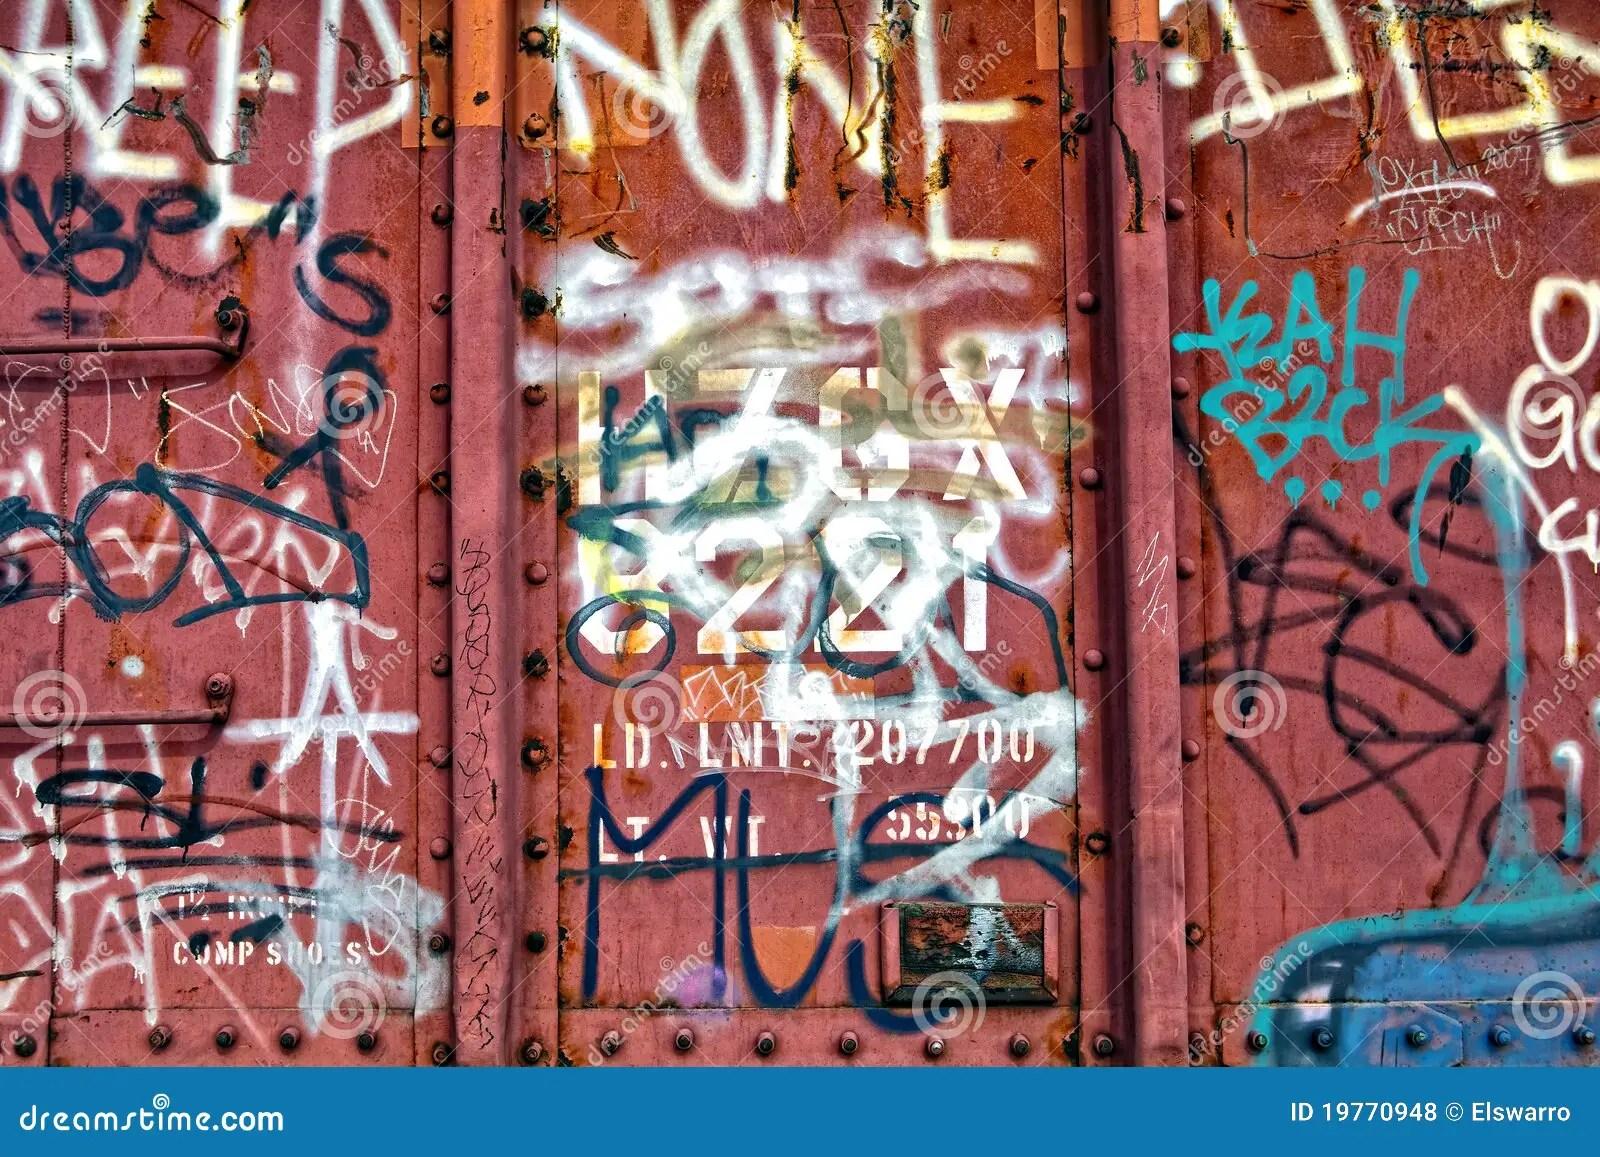 Train Graffiti Texture Stock Photo Image Of Different